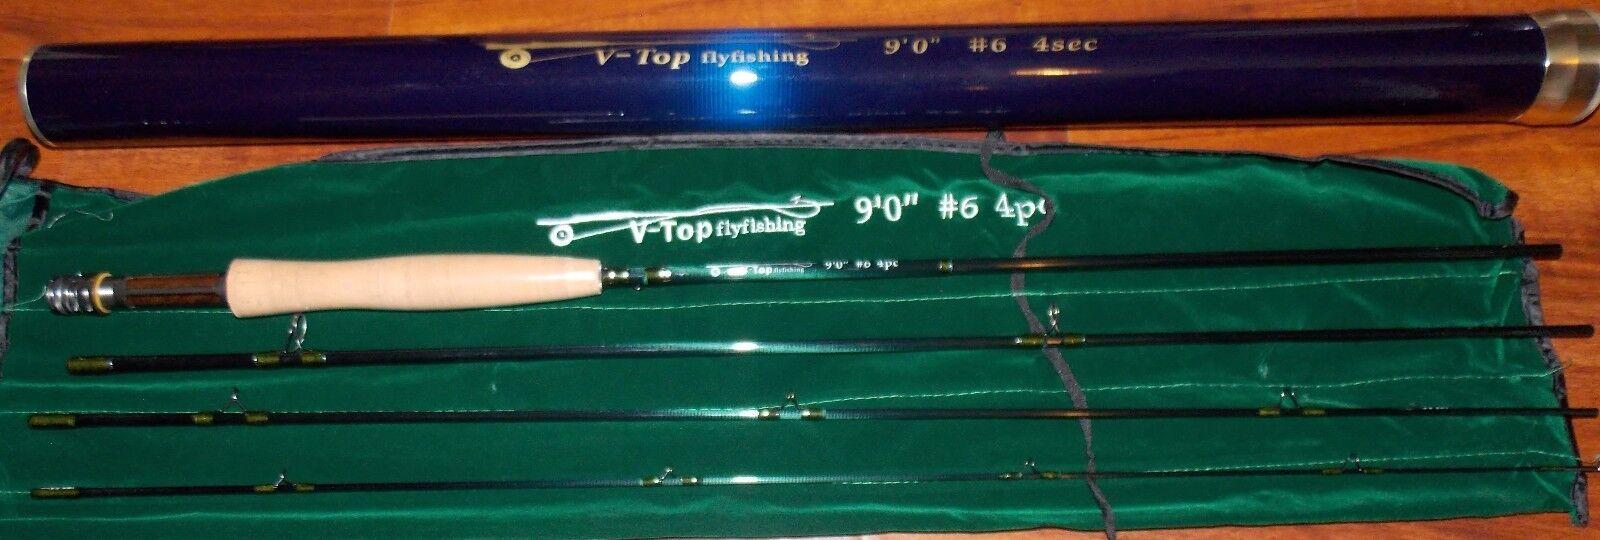 9'0'' WT 4Sec V-TOP Fly Fishing Rod FREE 3 DAY SHIPPING